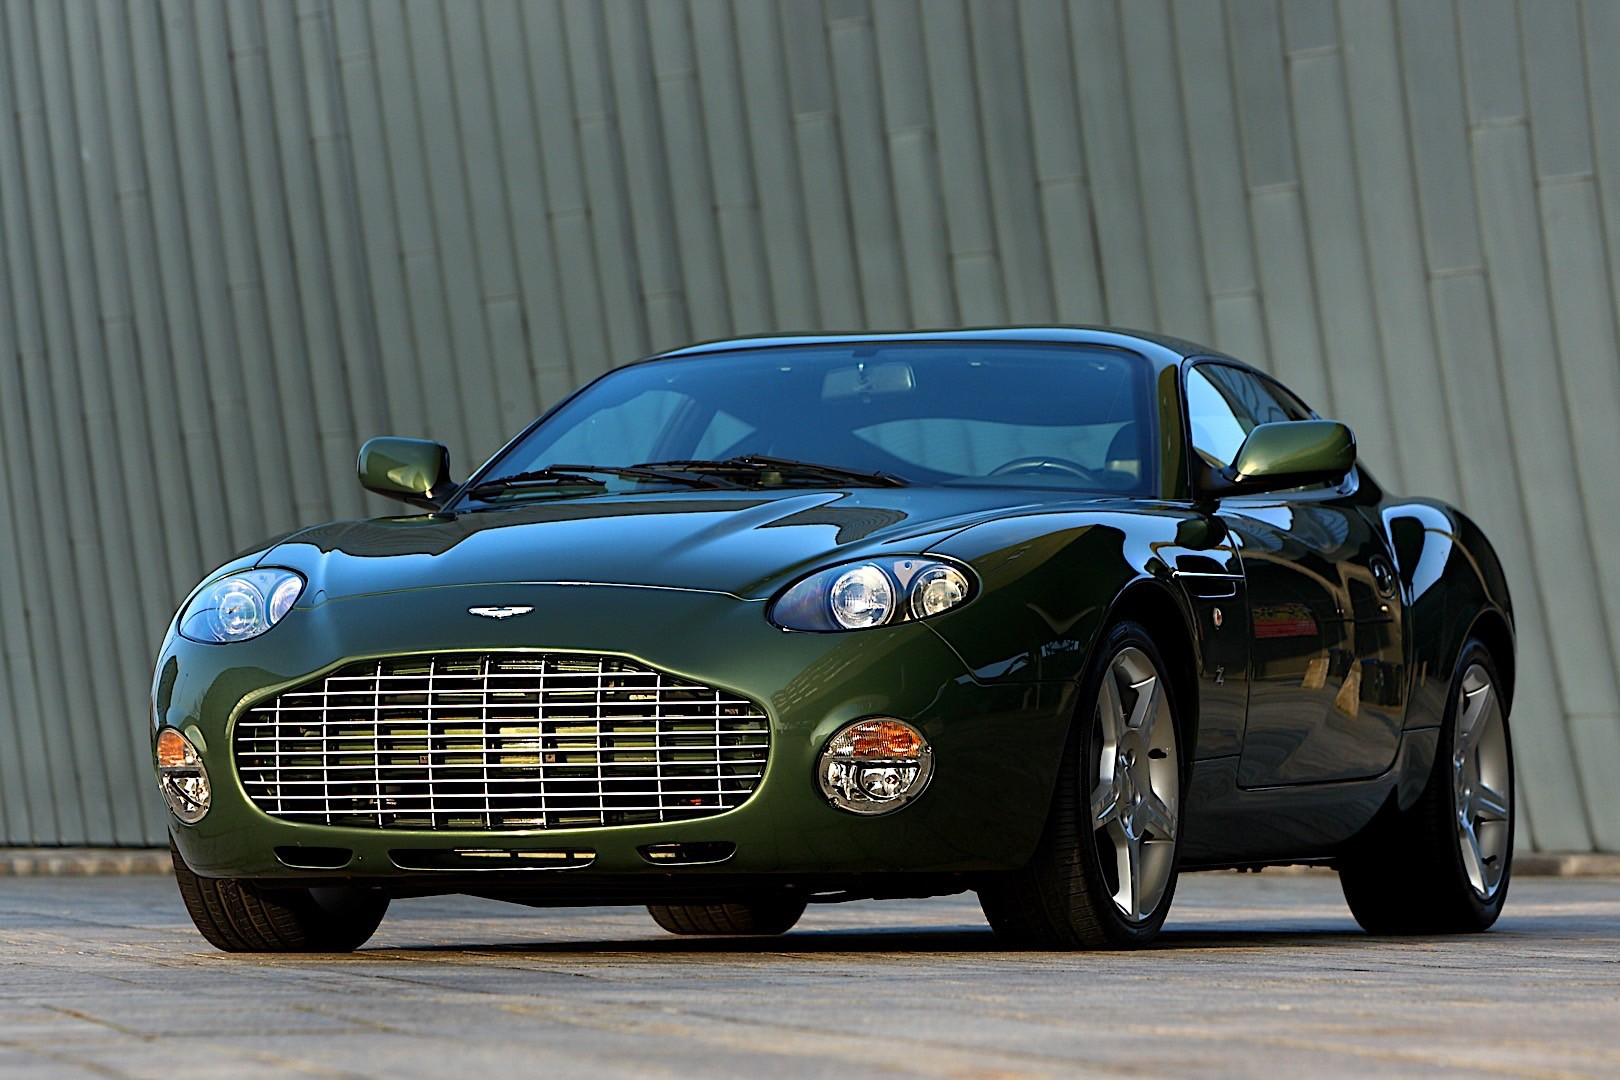 Aston Martin Db7 Zagato Specs 2003 Autoevolution